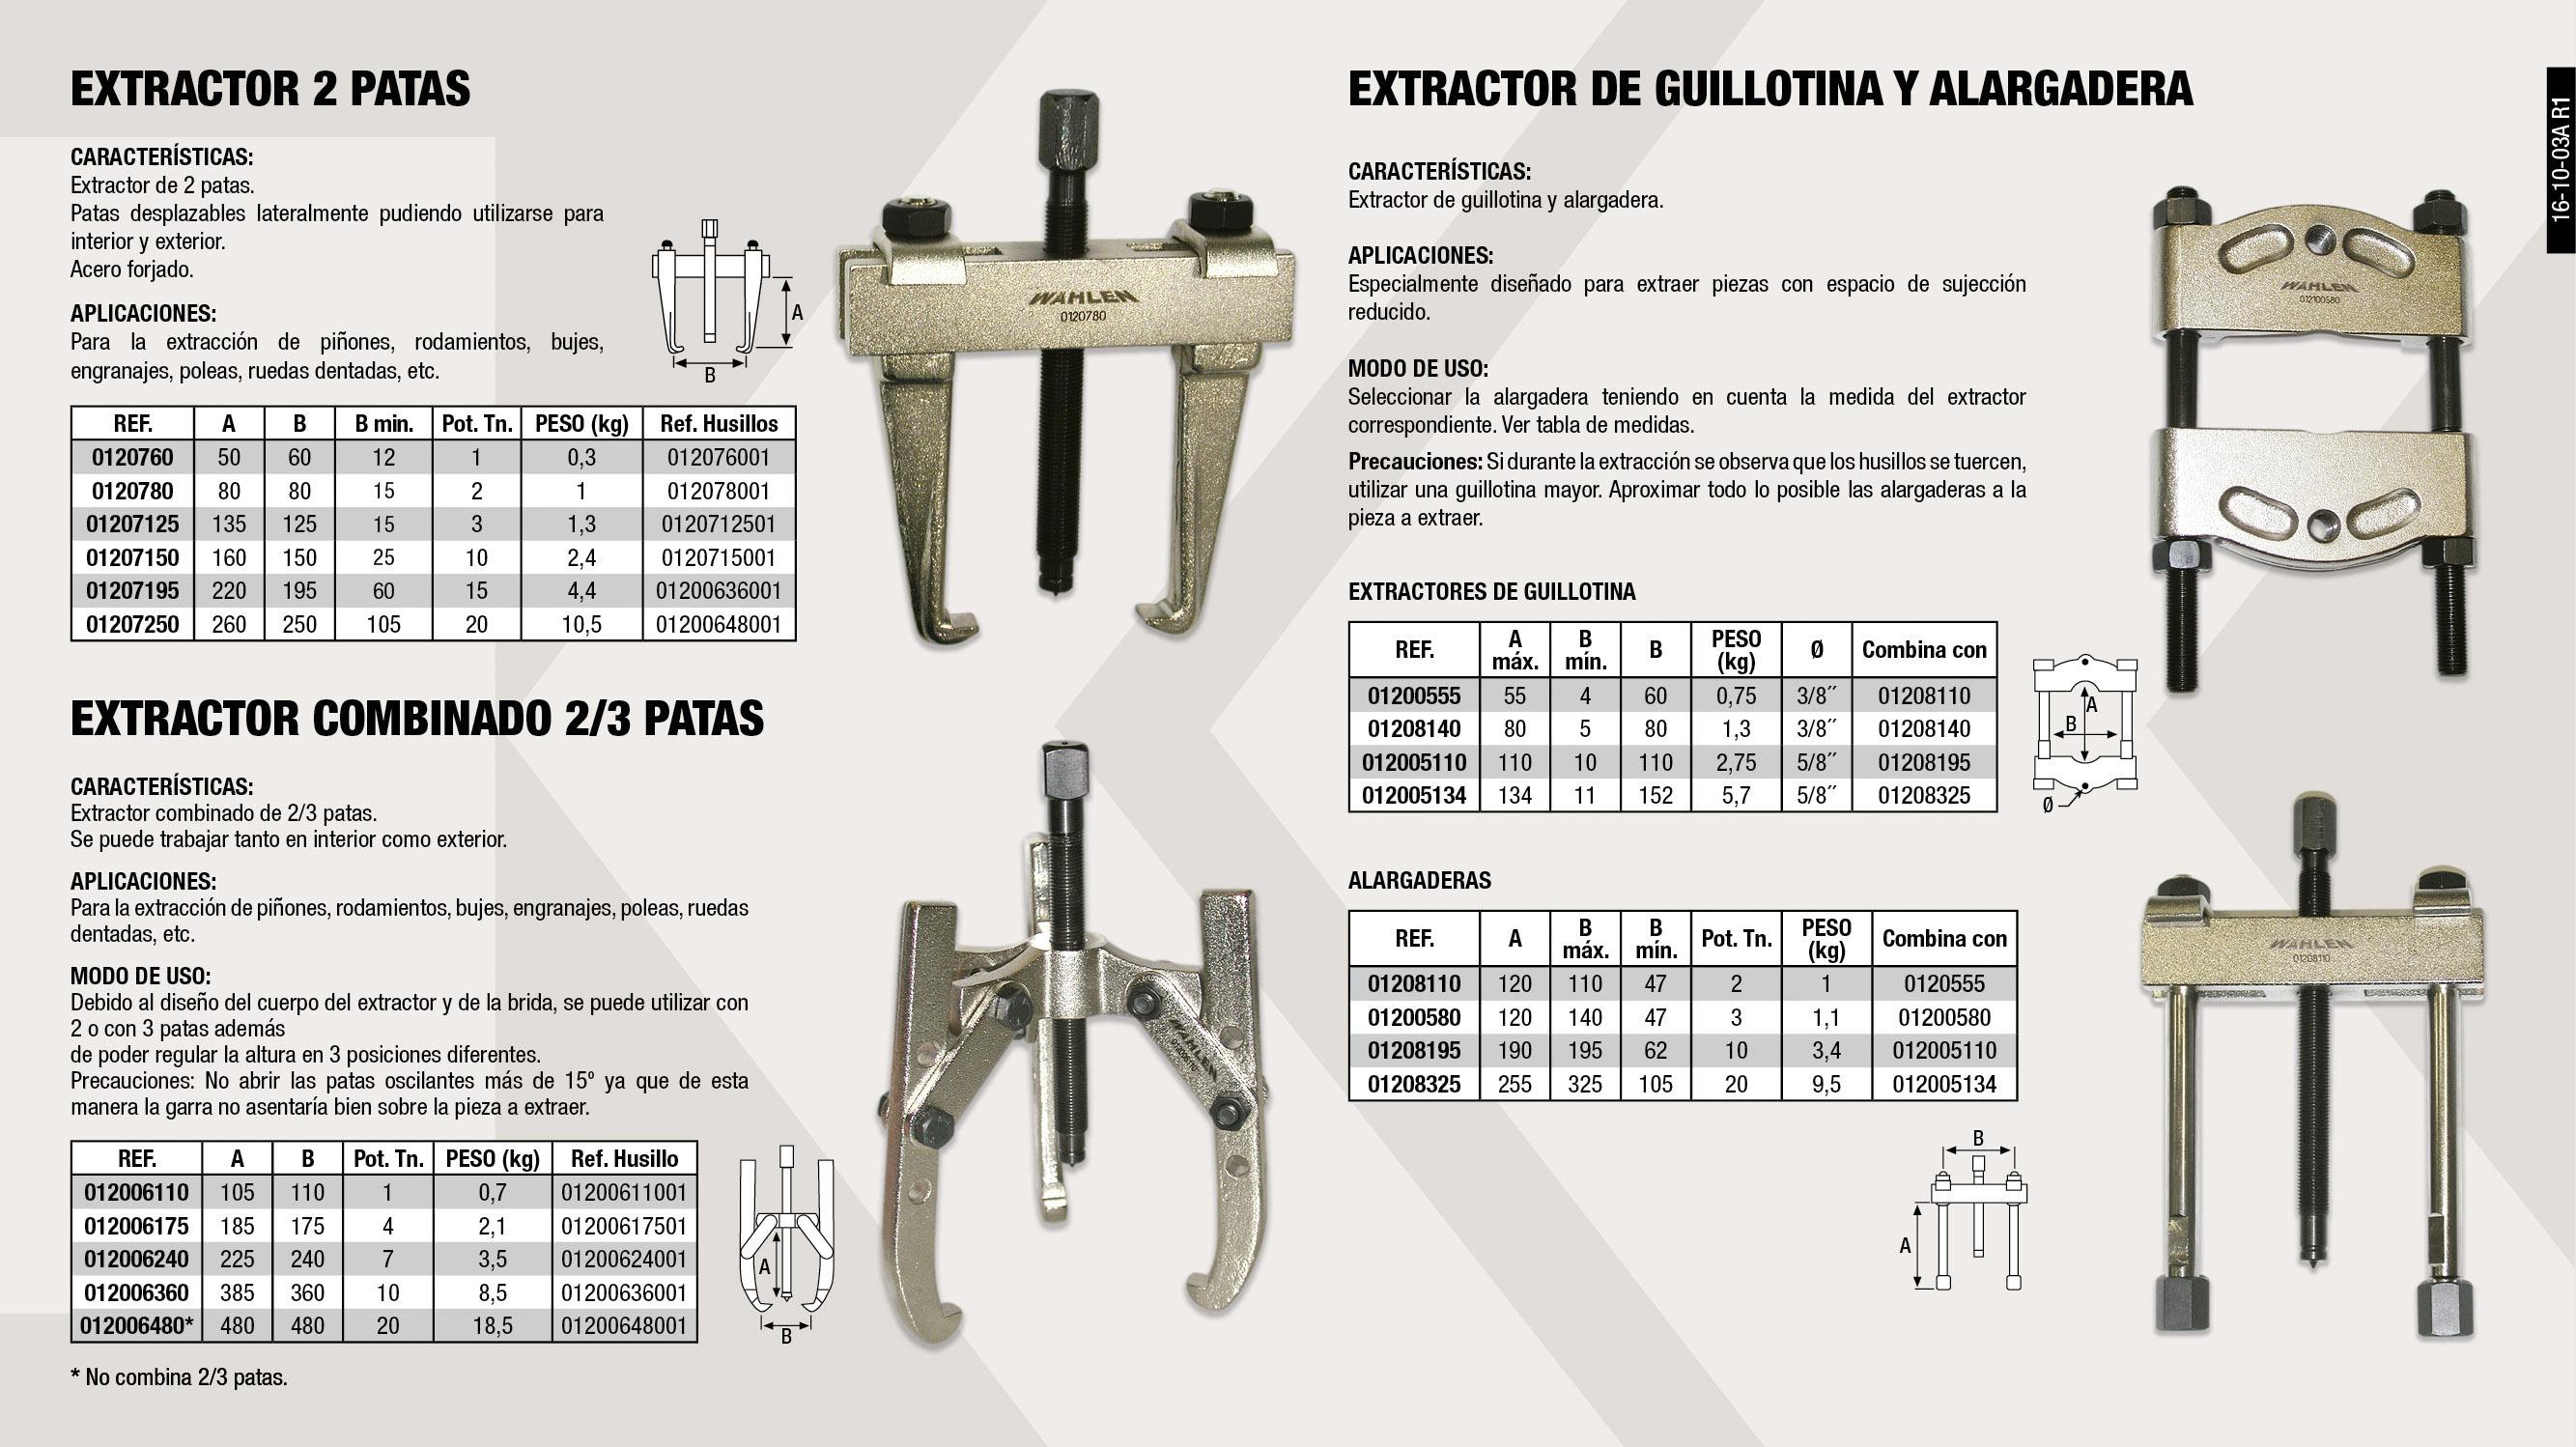 EXTRACTOR 2 PATAS 80X80MM                                   ,  HUSILLO EXTRACTOR 01207125                                  ,  ALARGADERA EXTRACTOR DE GUILLOTINA 120X140MM                ,  HUSILLO PARA EXTRACTOR 012006110                            ,  EXTRACTOR DE GUILLOTINA 60X55MM                             ,  ALARGADERA EXTRACTOE DE GUILLOTINA 255X325 V.I.             ,  EXTRACTOR DE GUILLOTINA 80X80 MM                            ,  HUSILLO PARA EXTRACTOR 012006175                            ,  EXTRACTOR DE GUILLOTINA 152X134 V.I.                        ,  HUSILLO EXTRACTOR 012006480- 01207250                       ,  EXTRACTOR COMBINADO 2/3 PATAS 185X175MM                     ,  EXTRACTOR 2 PATAS 135X125MM                                 ,  EXTRACTOR COMBINADO 2/3 PATAS 225X240MM                     ,  EXTRACTOR DE GUILLOTINA 110X110MM                           ,  EXTRACTOR COMBINADO 2/3 PATAS 105X110MM                     ,  HUSILLO EXTRACTOR 01207150                                  ,  HUSILLO PARA EXTRACTOR 012006240                            ,  ALARGADERA EXTRACTOR DE GUILLOTINA 190X195MM                ,  EXTRACTOR COMBINADO 2/3 PATAS 480X480 V.I.                  ,  EXTRACTOR 2 PATAS 160X150MM                                 ,  ALARGADERA EXTRACTOR DE GUILLOTINA 120X110MM                ,  EXTRACTOR COMBINADO 2/3 PATAS 385X360MM                     ,  EXTRACTOR 2 PATAS 220X195MM                                 ,  HUSILLO EXTRACTOR 0120760                                   ,  EXTRACTOR 2 PATAS 260X250 V.I.                              ,  EXTRACTOR 2 PATAS 50X60 MM                                  ,  HUSILLO PARA EXTRACTOR 012006360-01207195                   ,  HUSILLO EXTRACTOR 0120780                                   ,